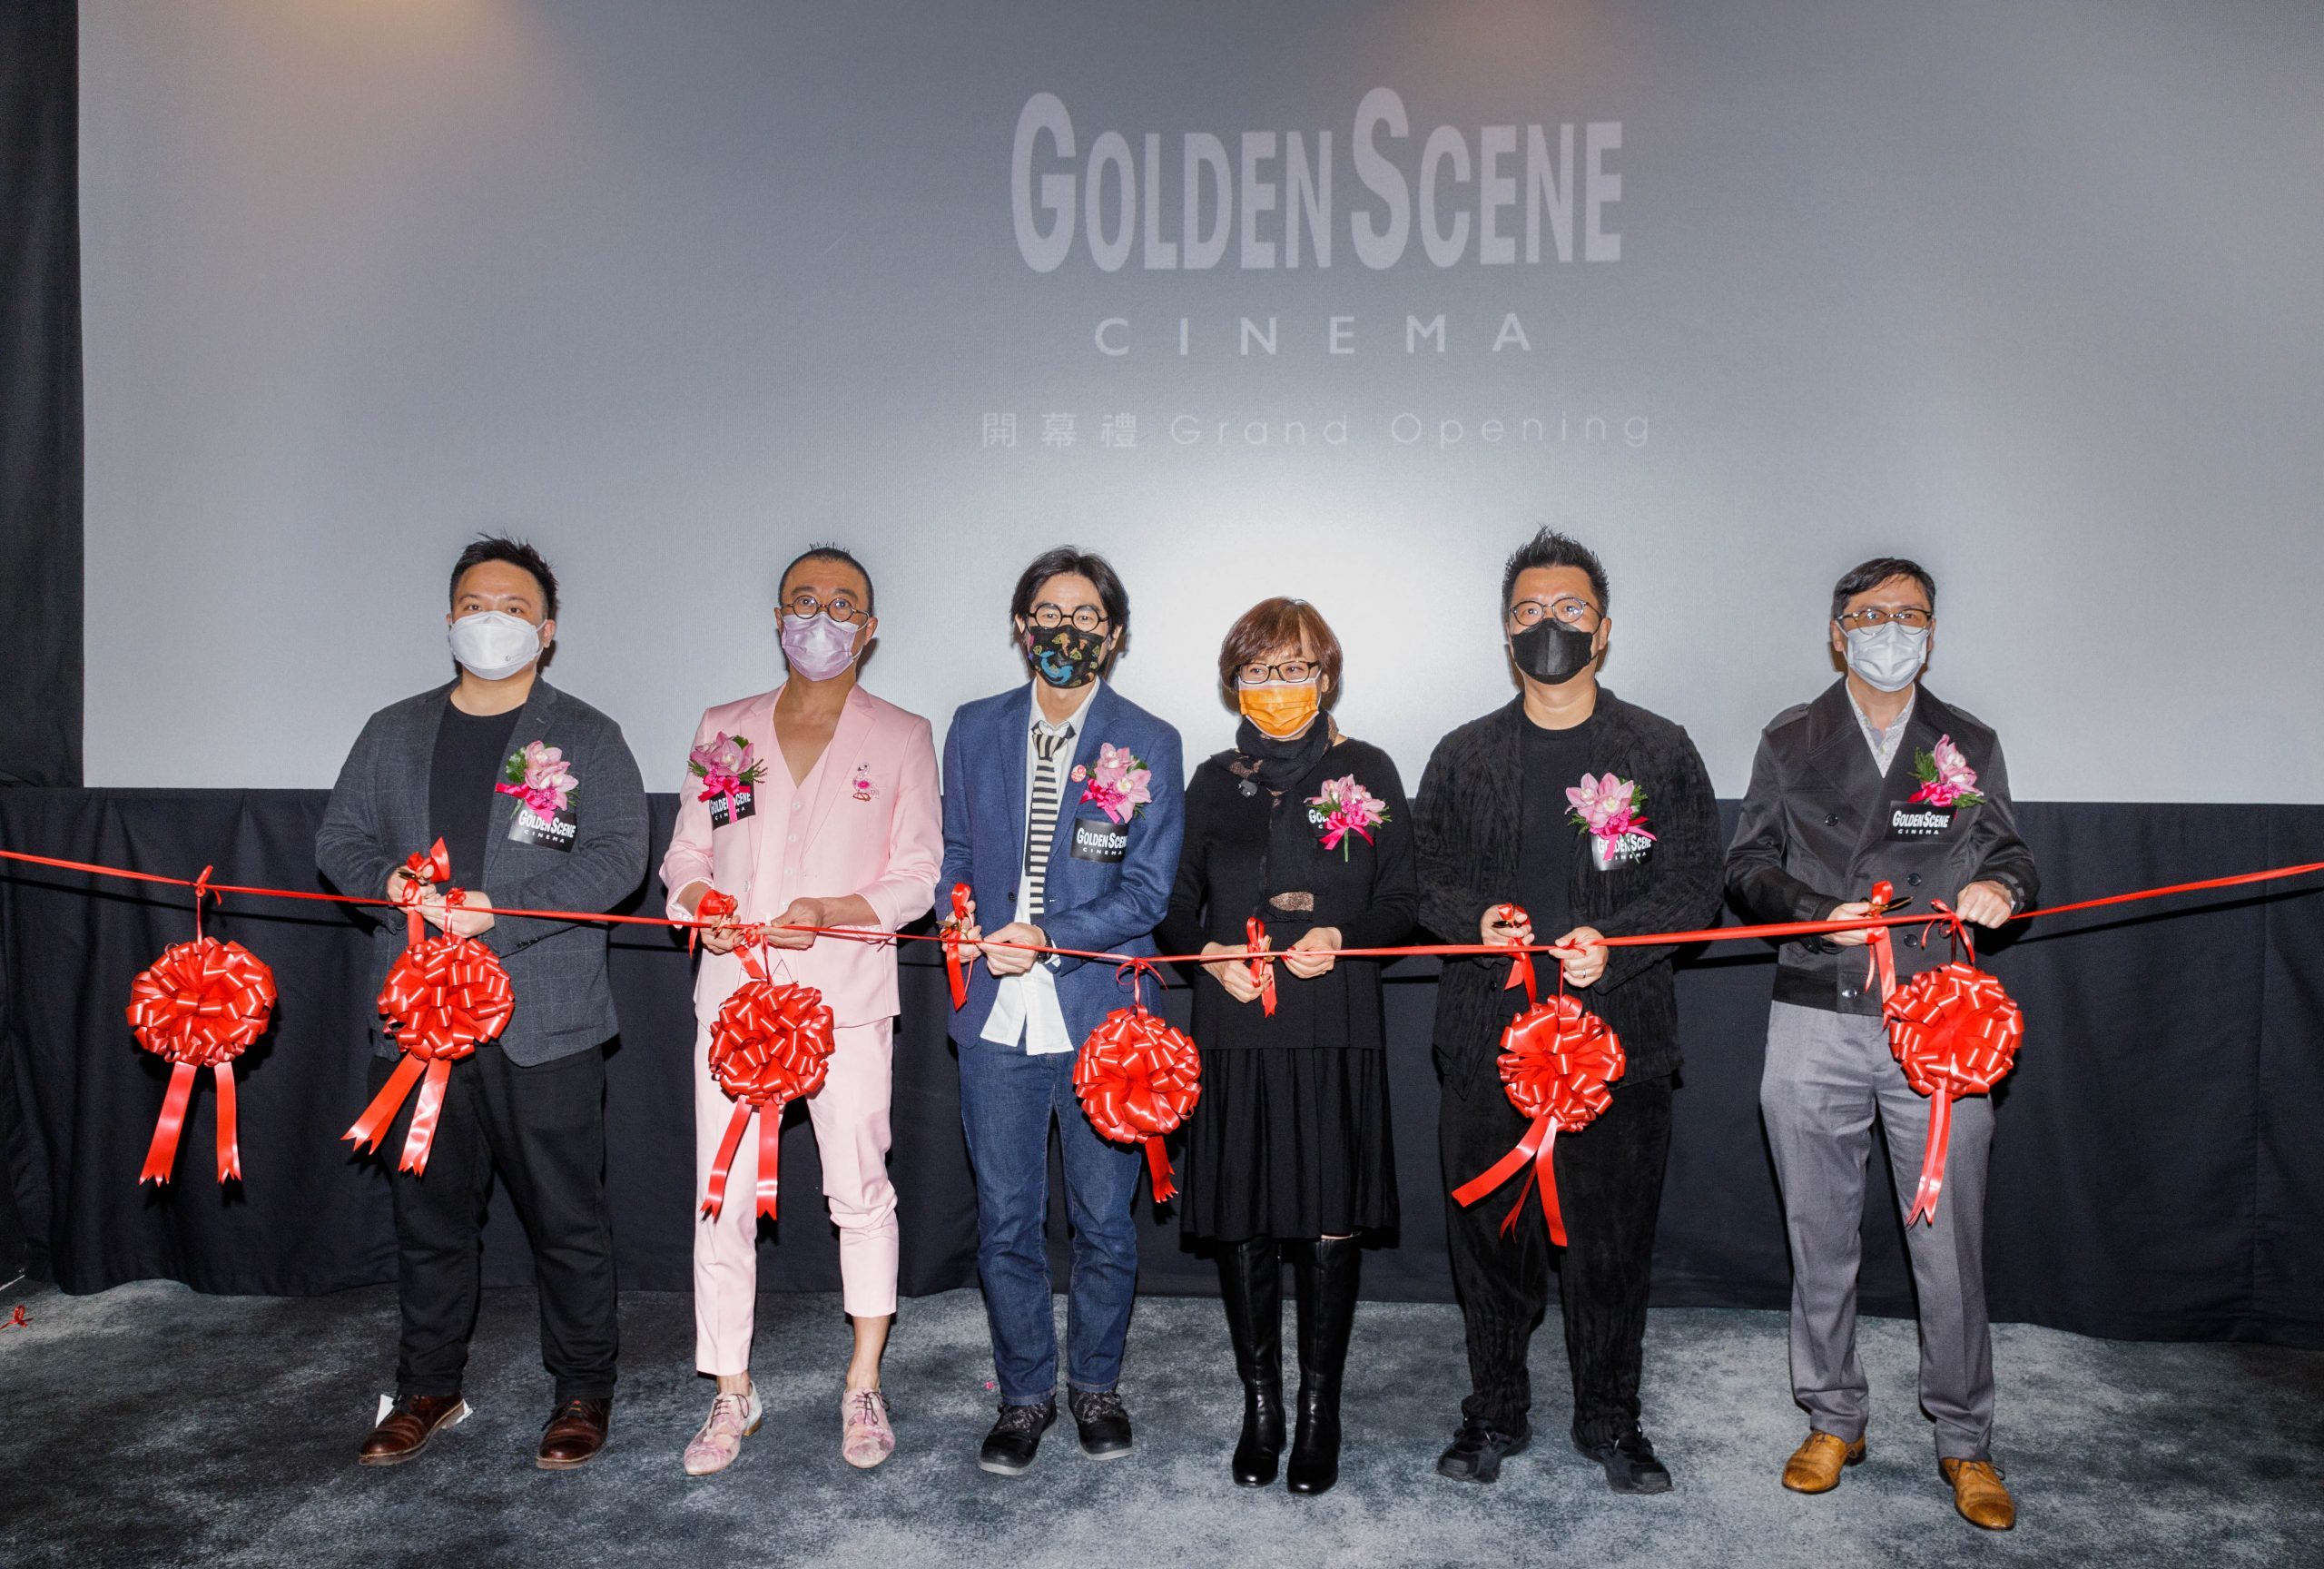 Golden Scene 高先電影院 電影發行 開幕  曾麗芬 黃修平 王利民